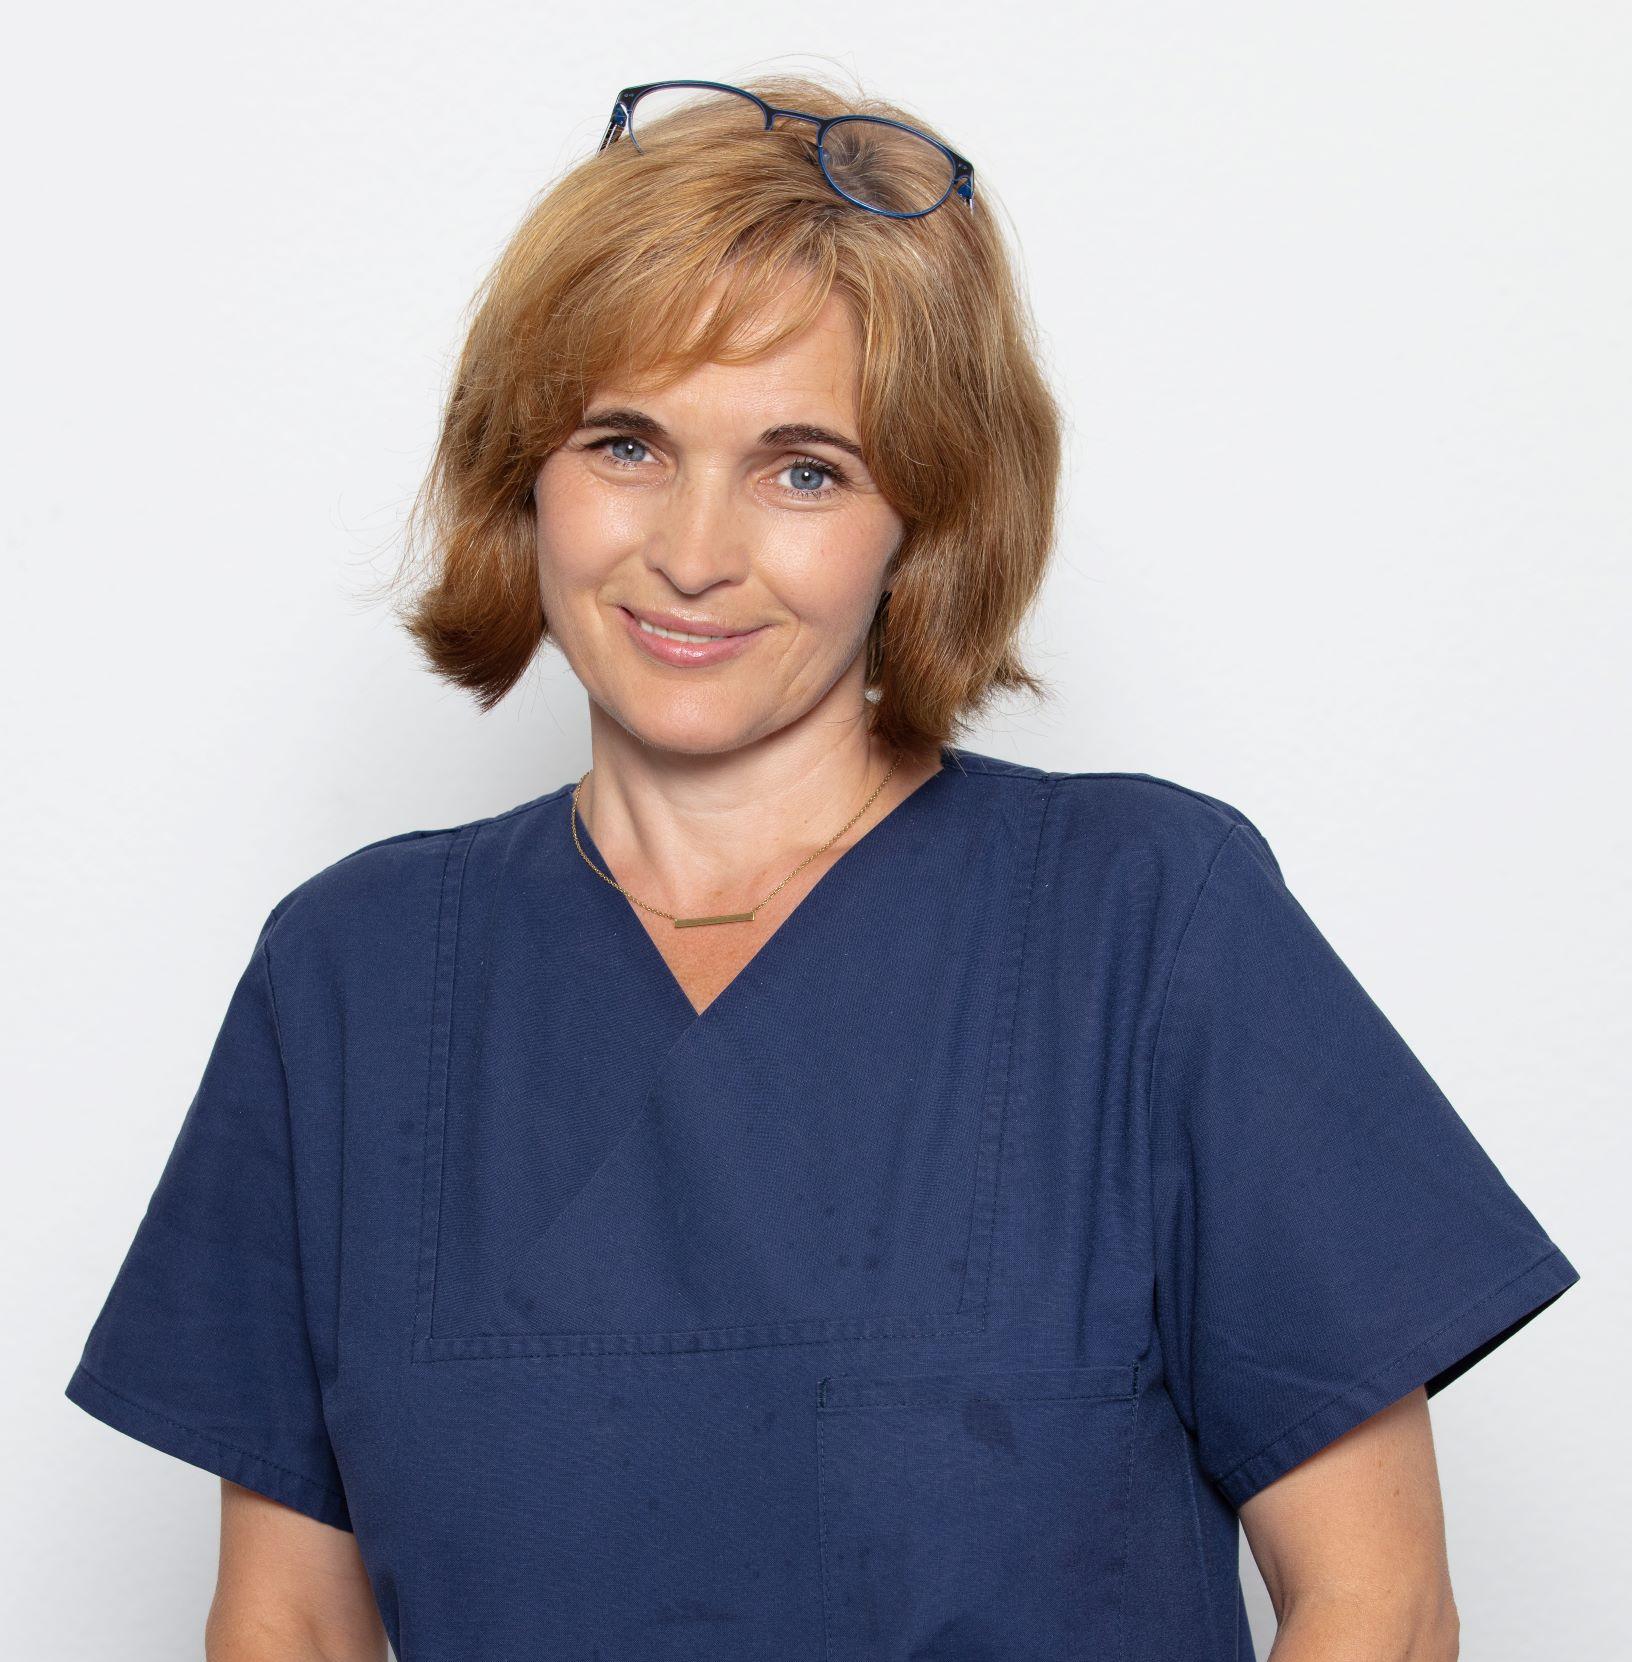 Elzbieta Drozdowska